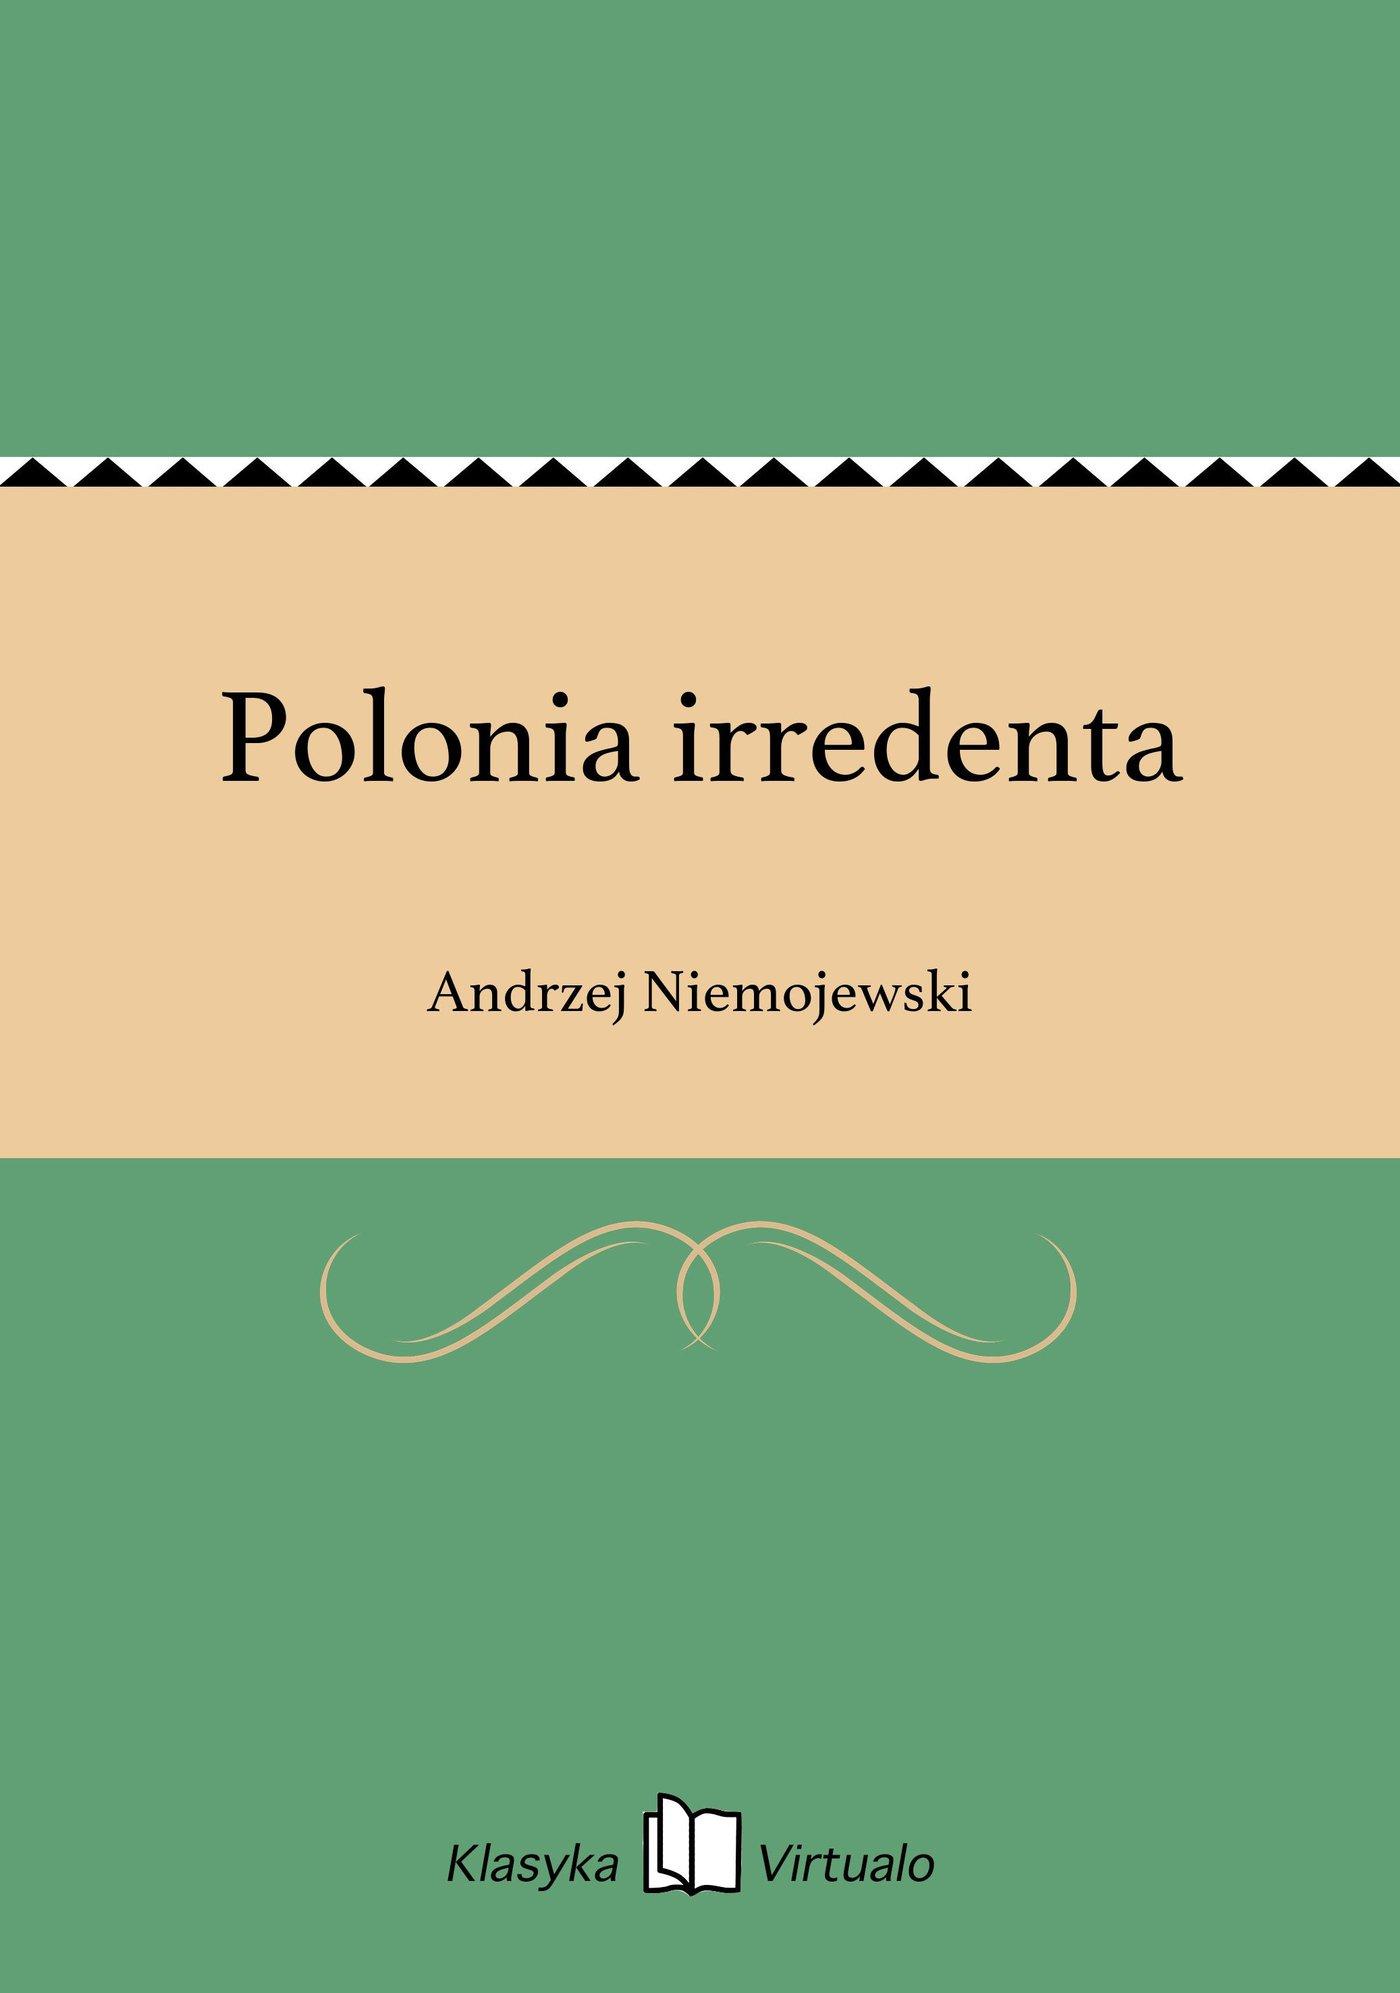 Polonia irredenta - Ebook (Książka EPUB) do pobrania w formacie EPUB